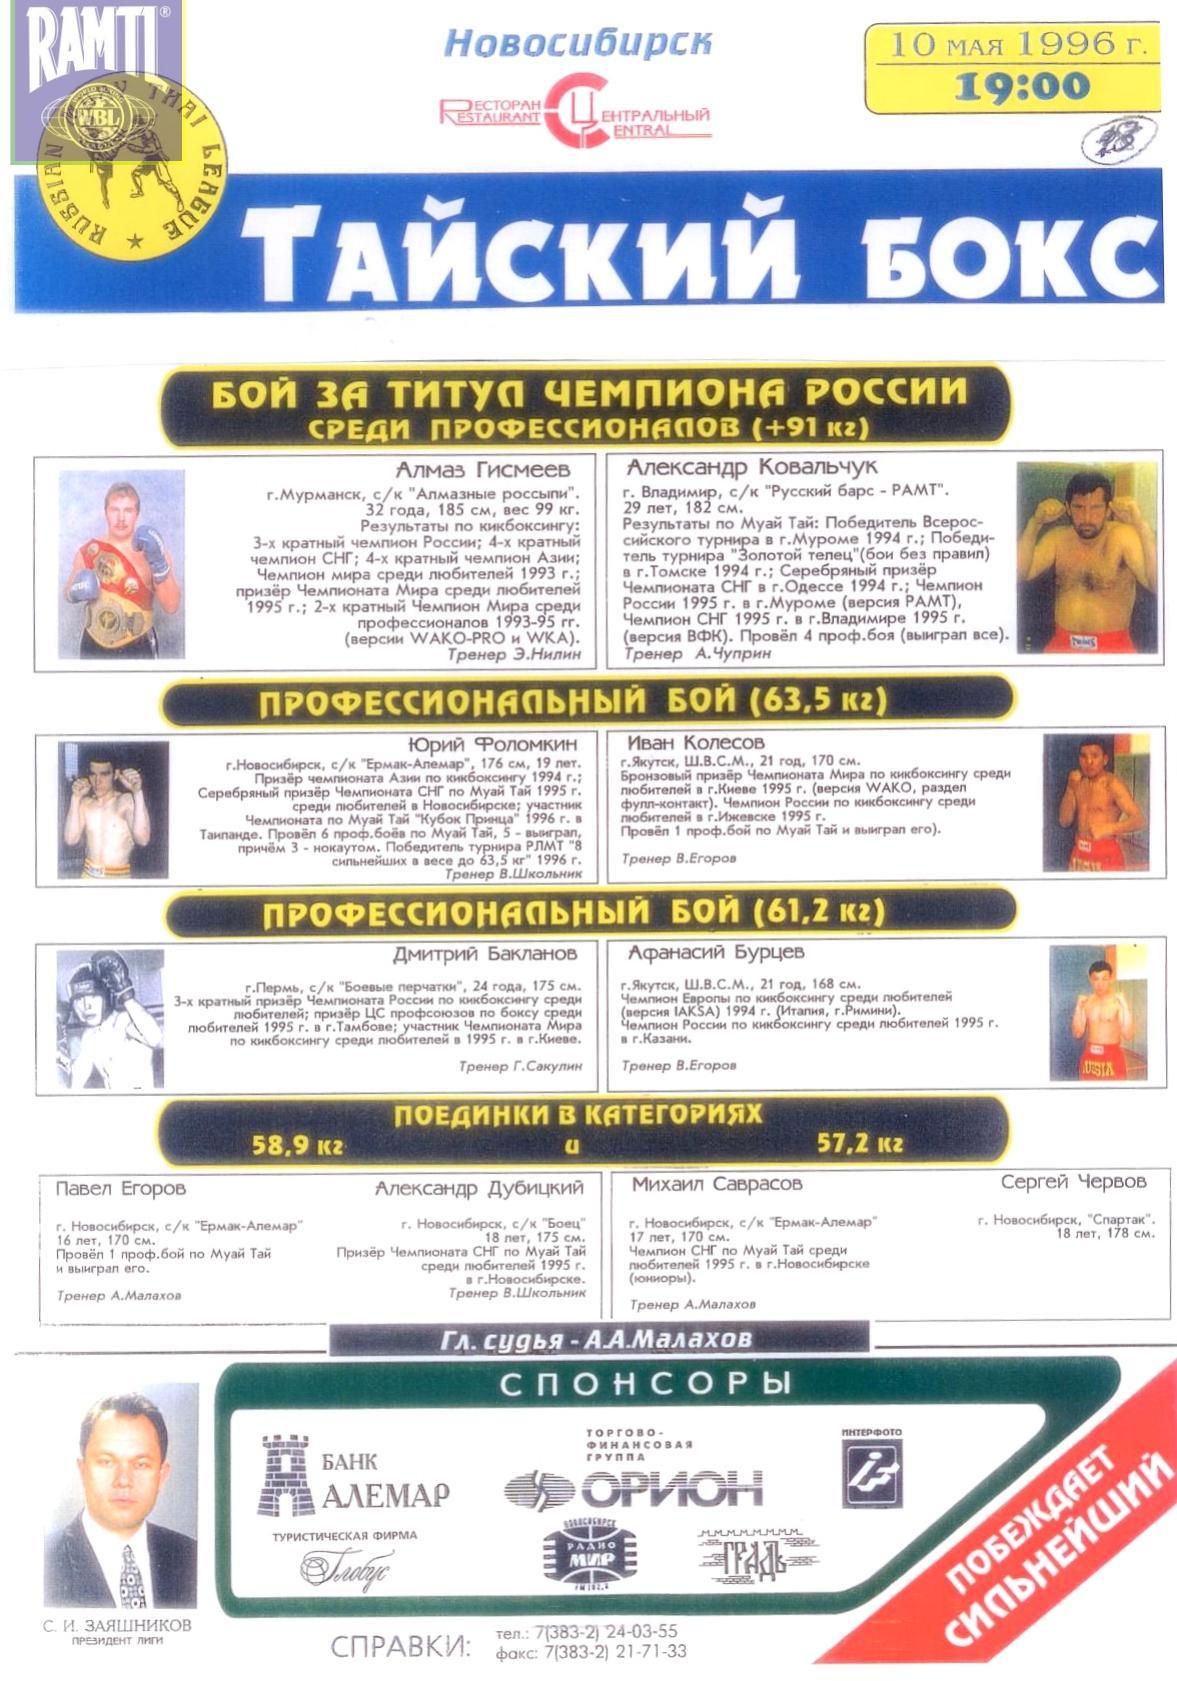 1996-05-10_Novosibirsk